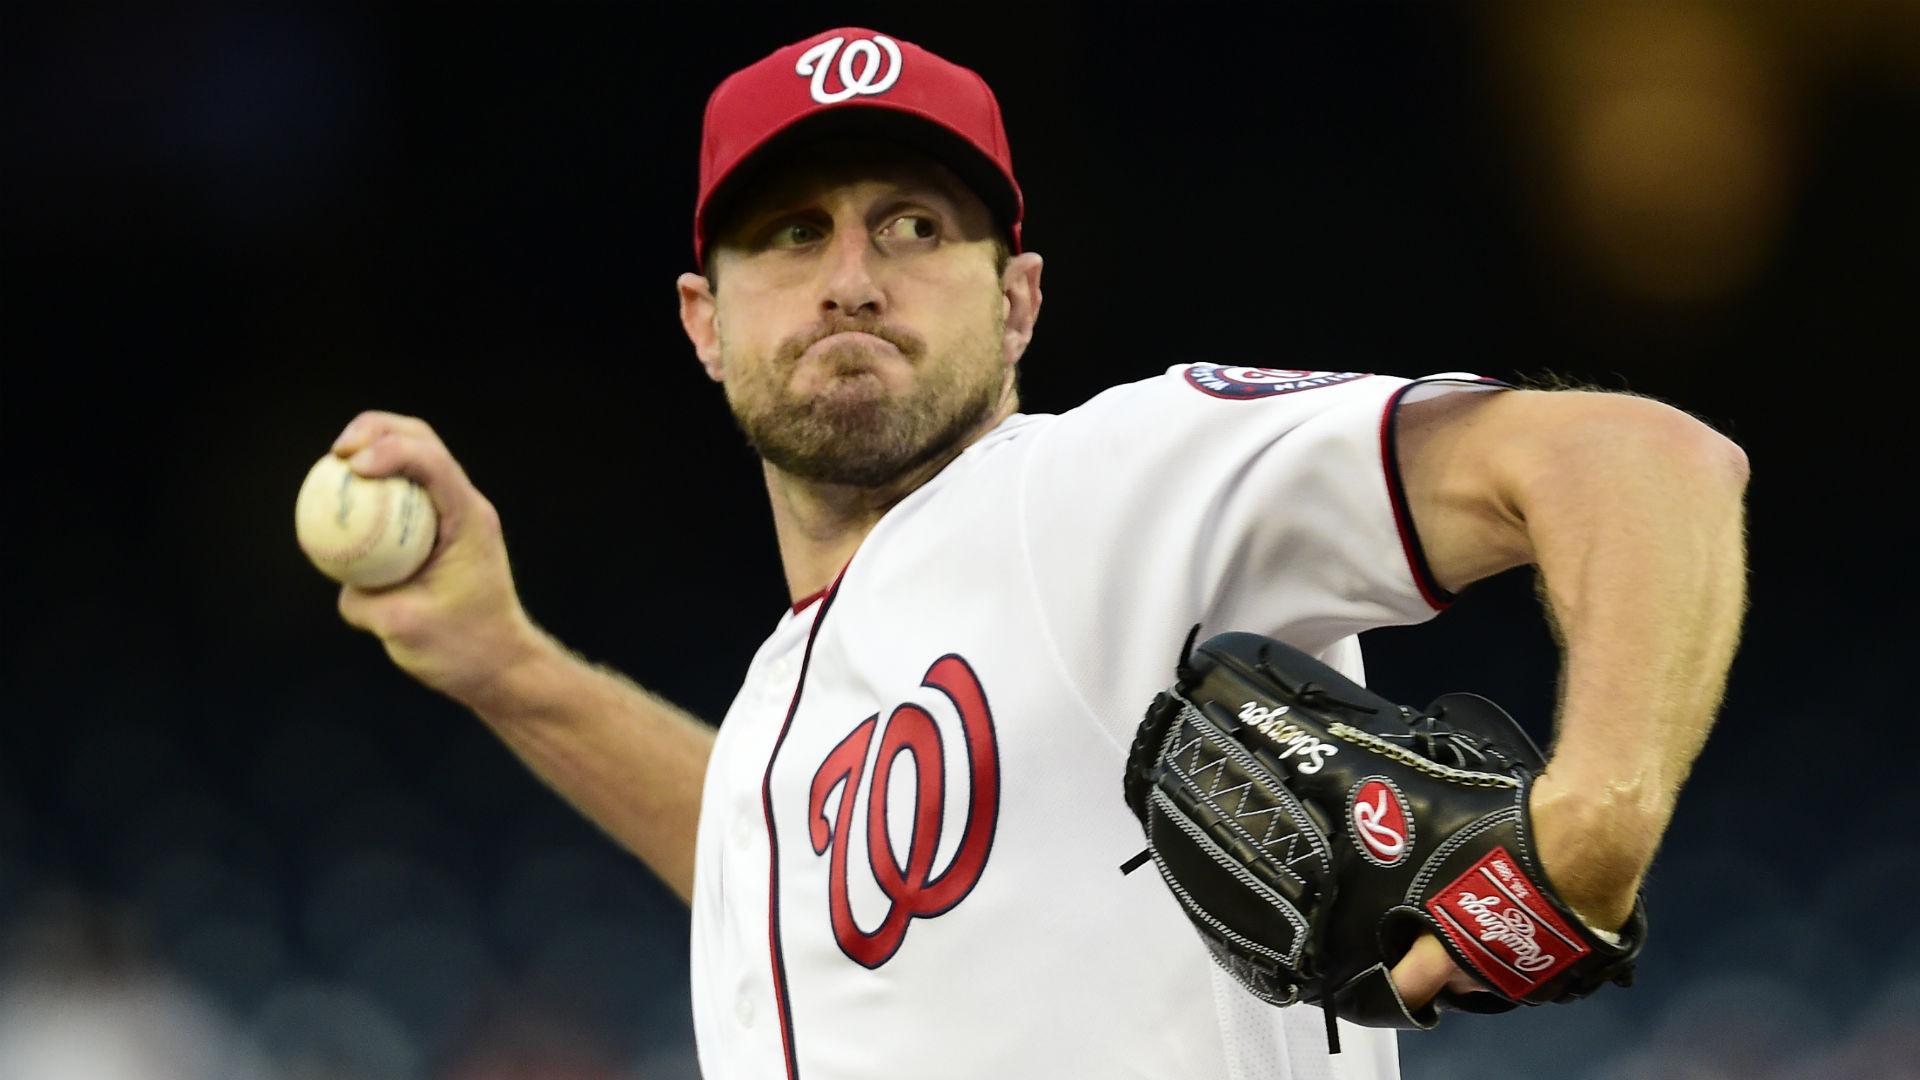 Nationals' Max Scherzer leaves start vs. Mets after one inning 1